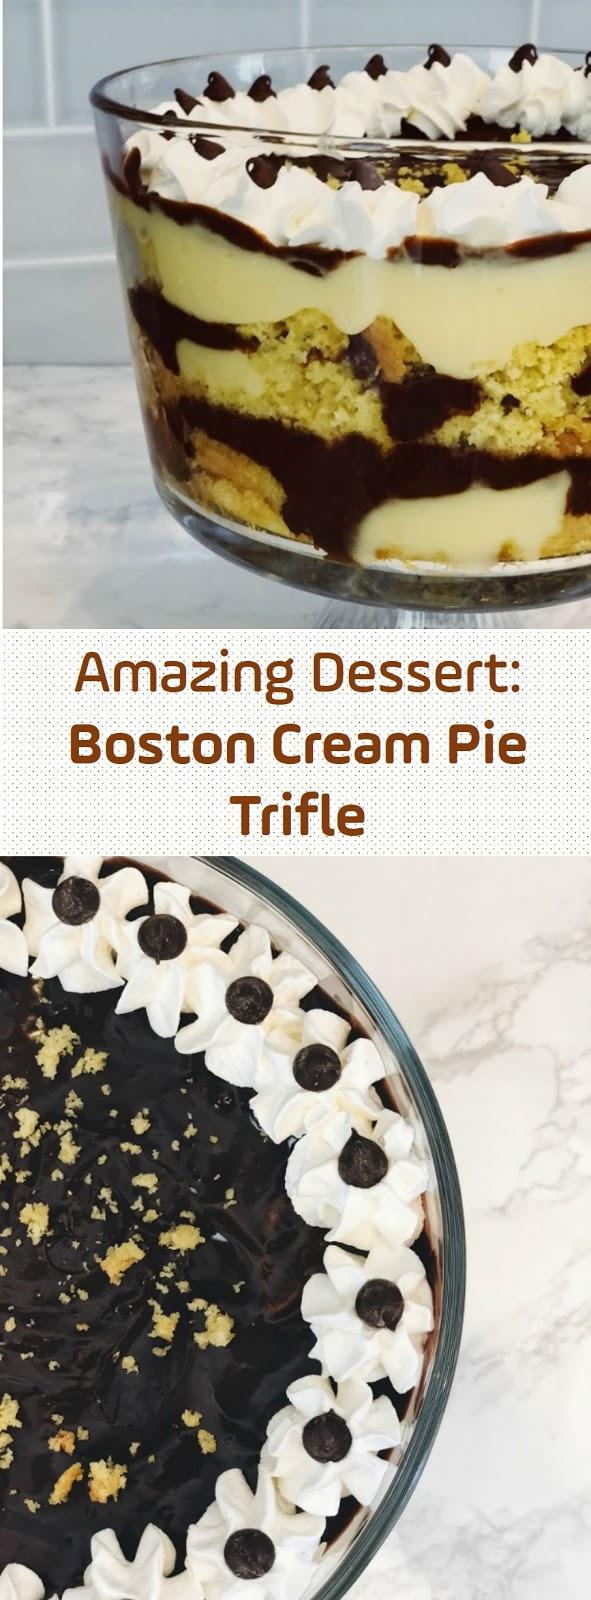 Amazing Dessert: Boston Cream Pie Trifle